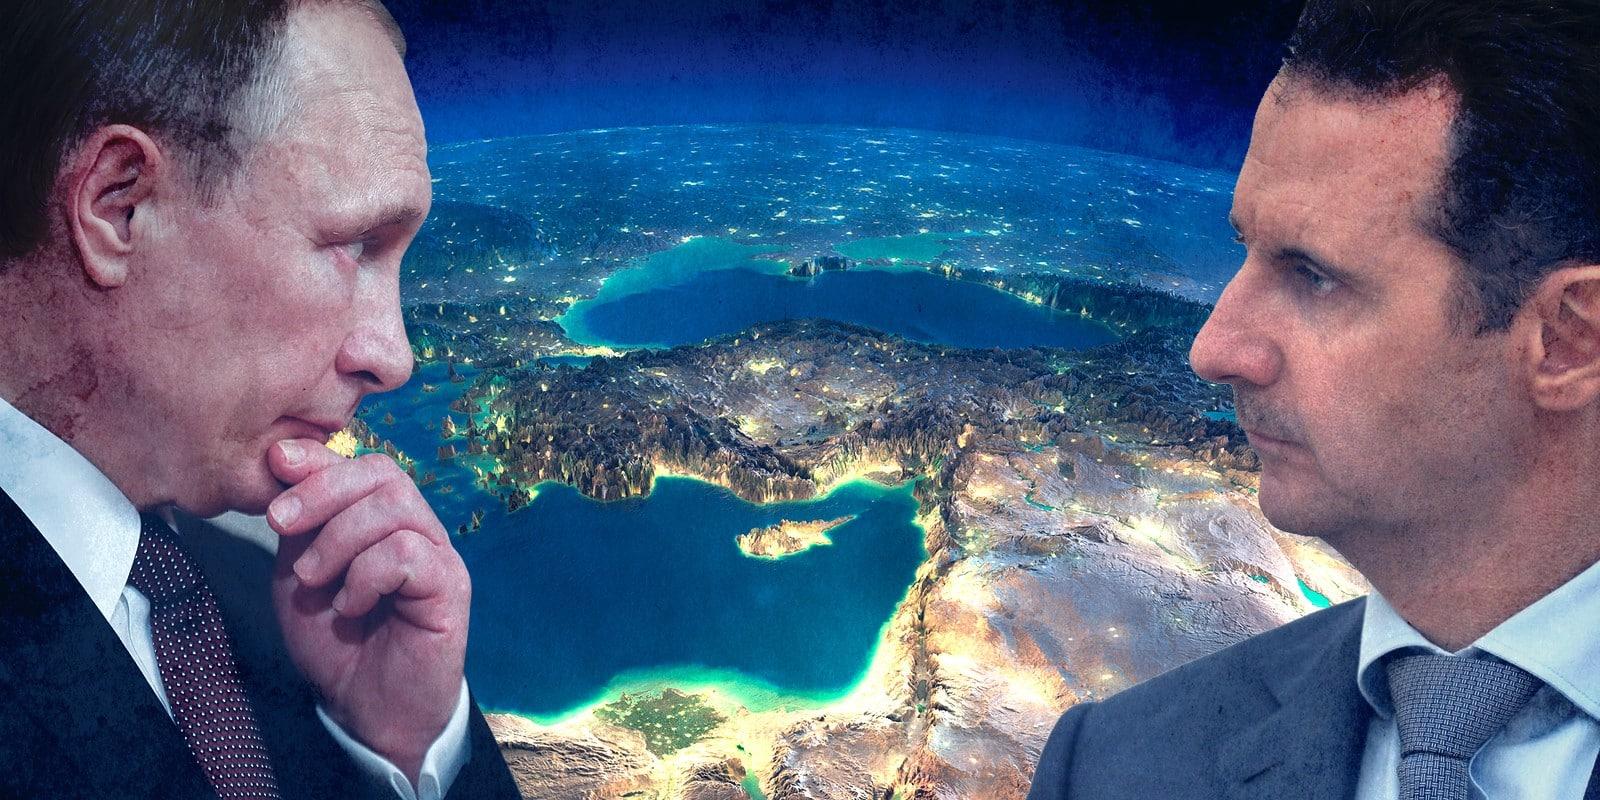 Assad and Putin middle east illustration